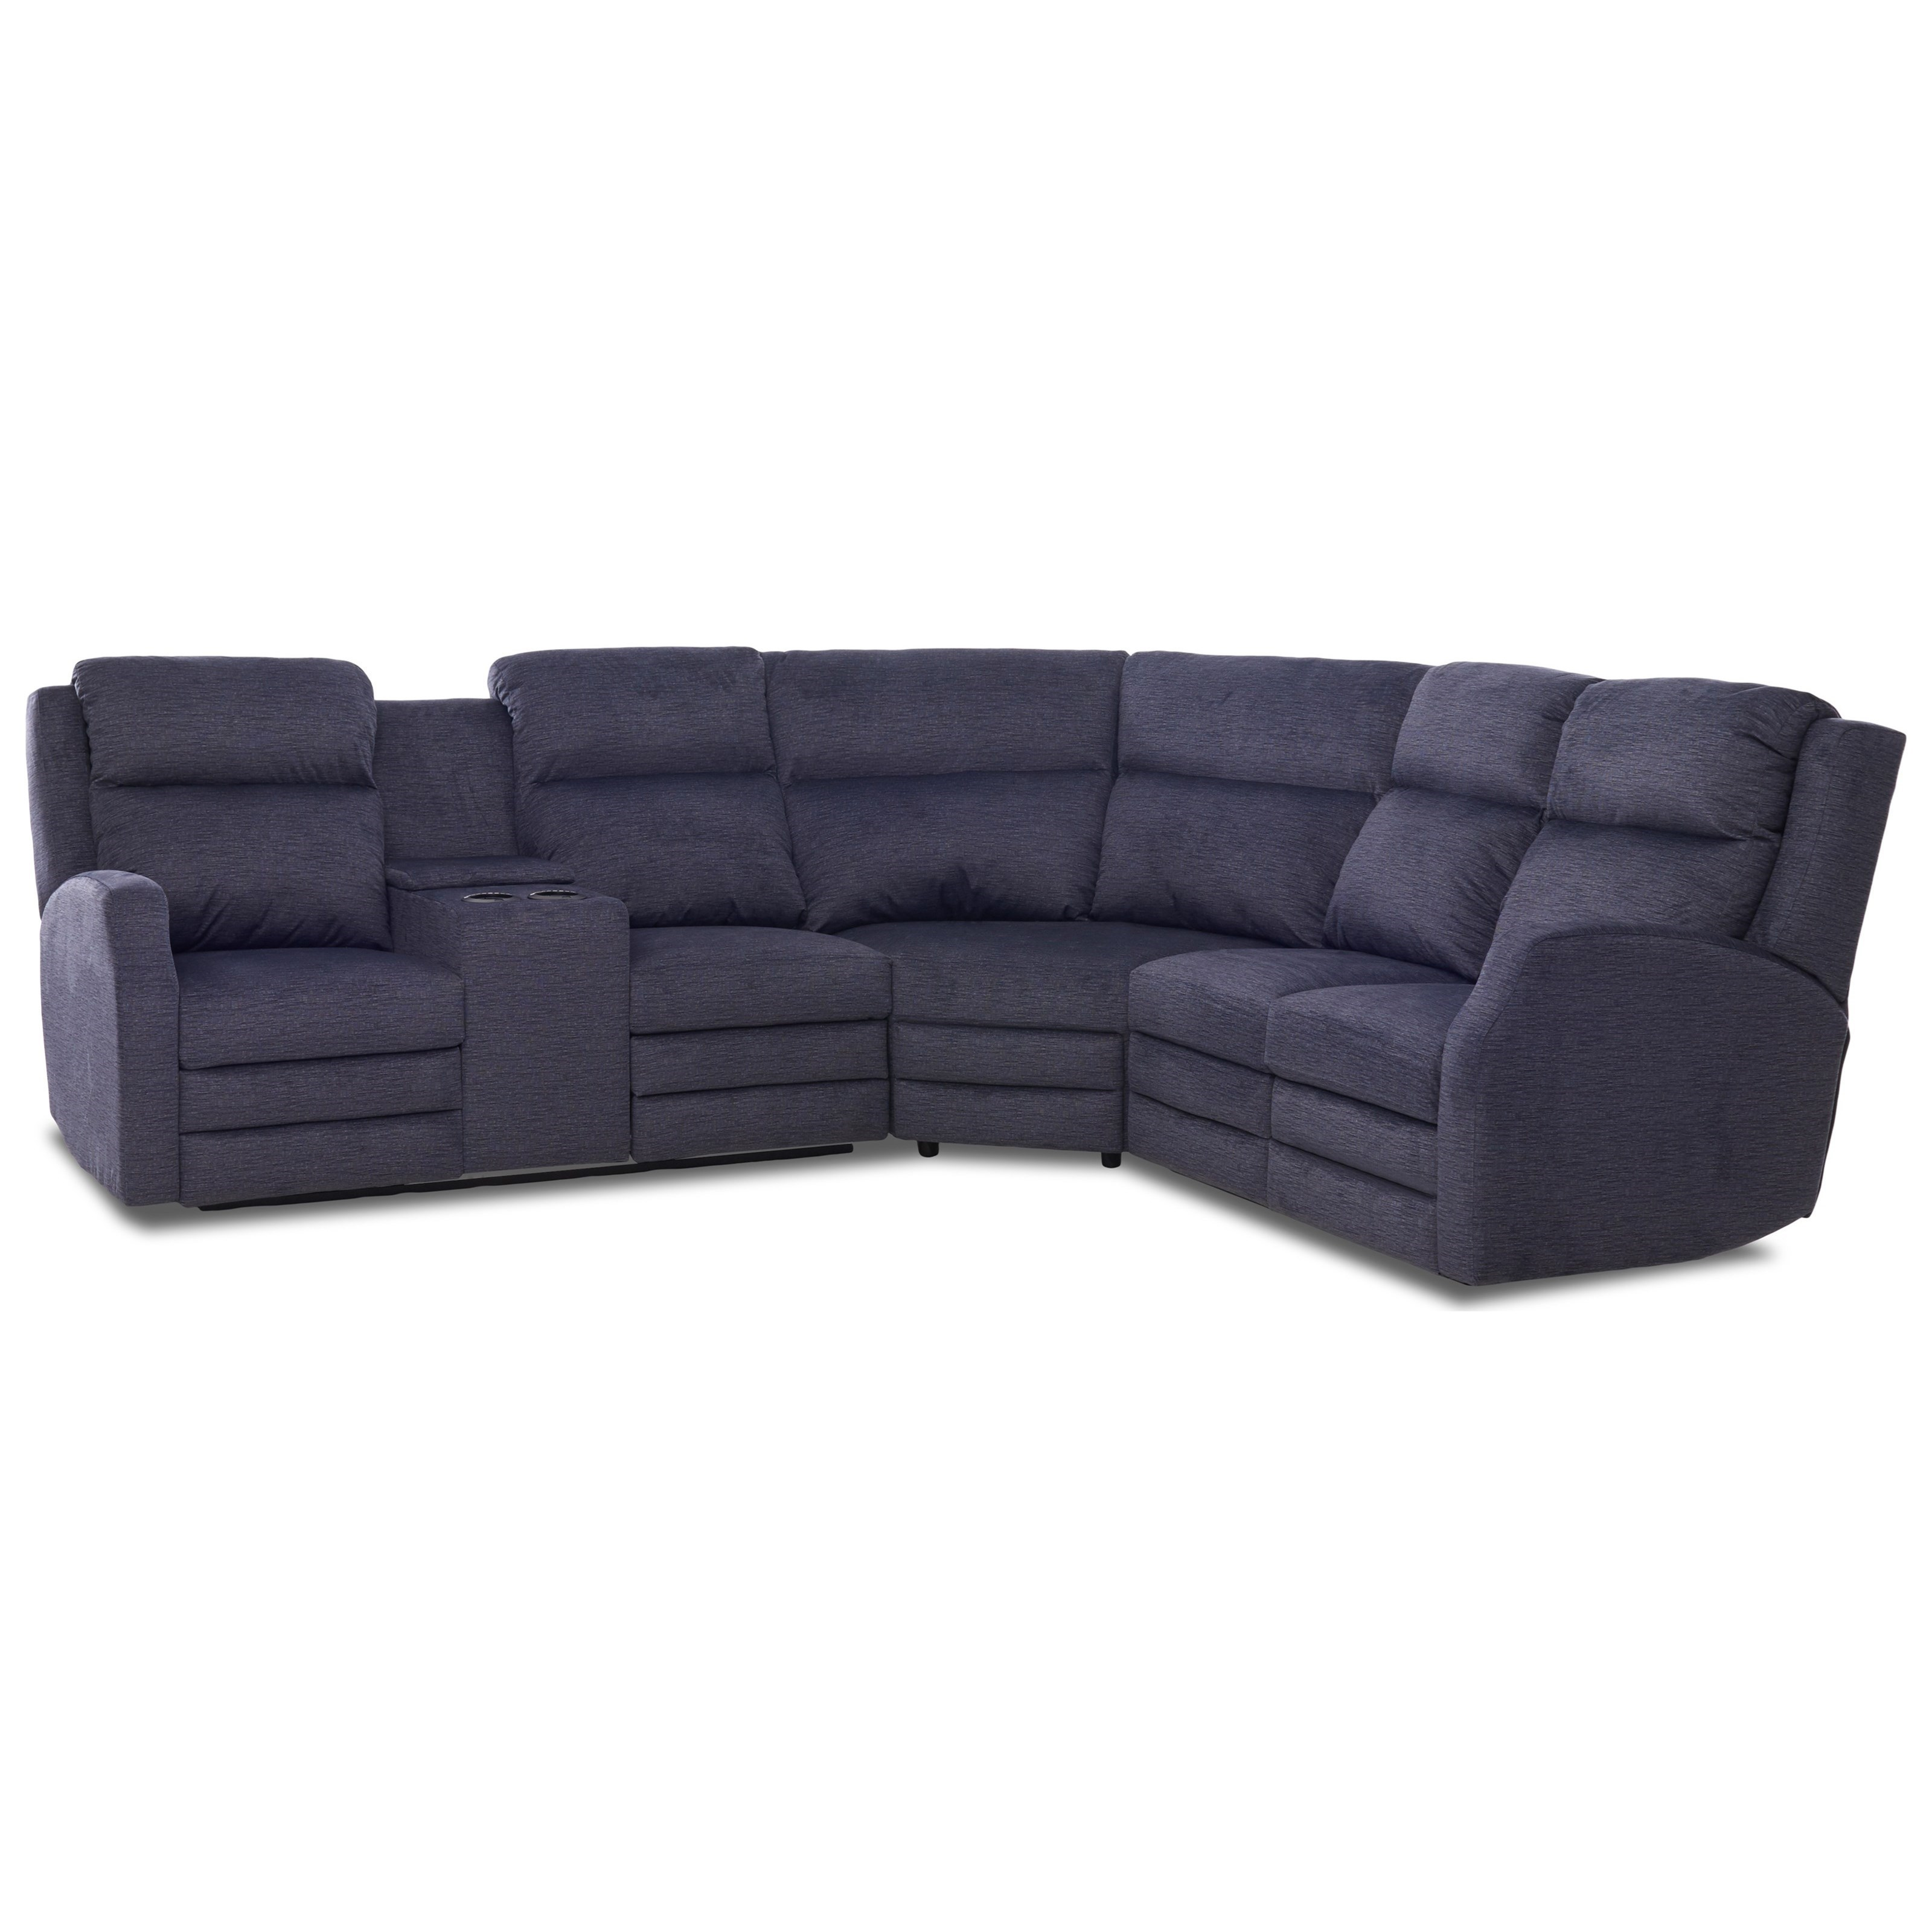 kamiah 4 seat power reclining sectional sofa